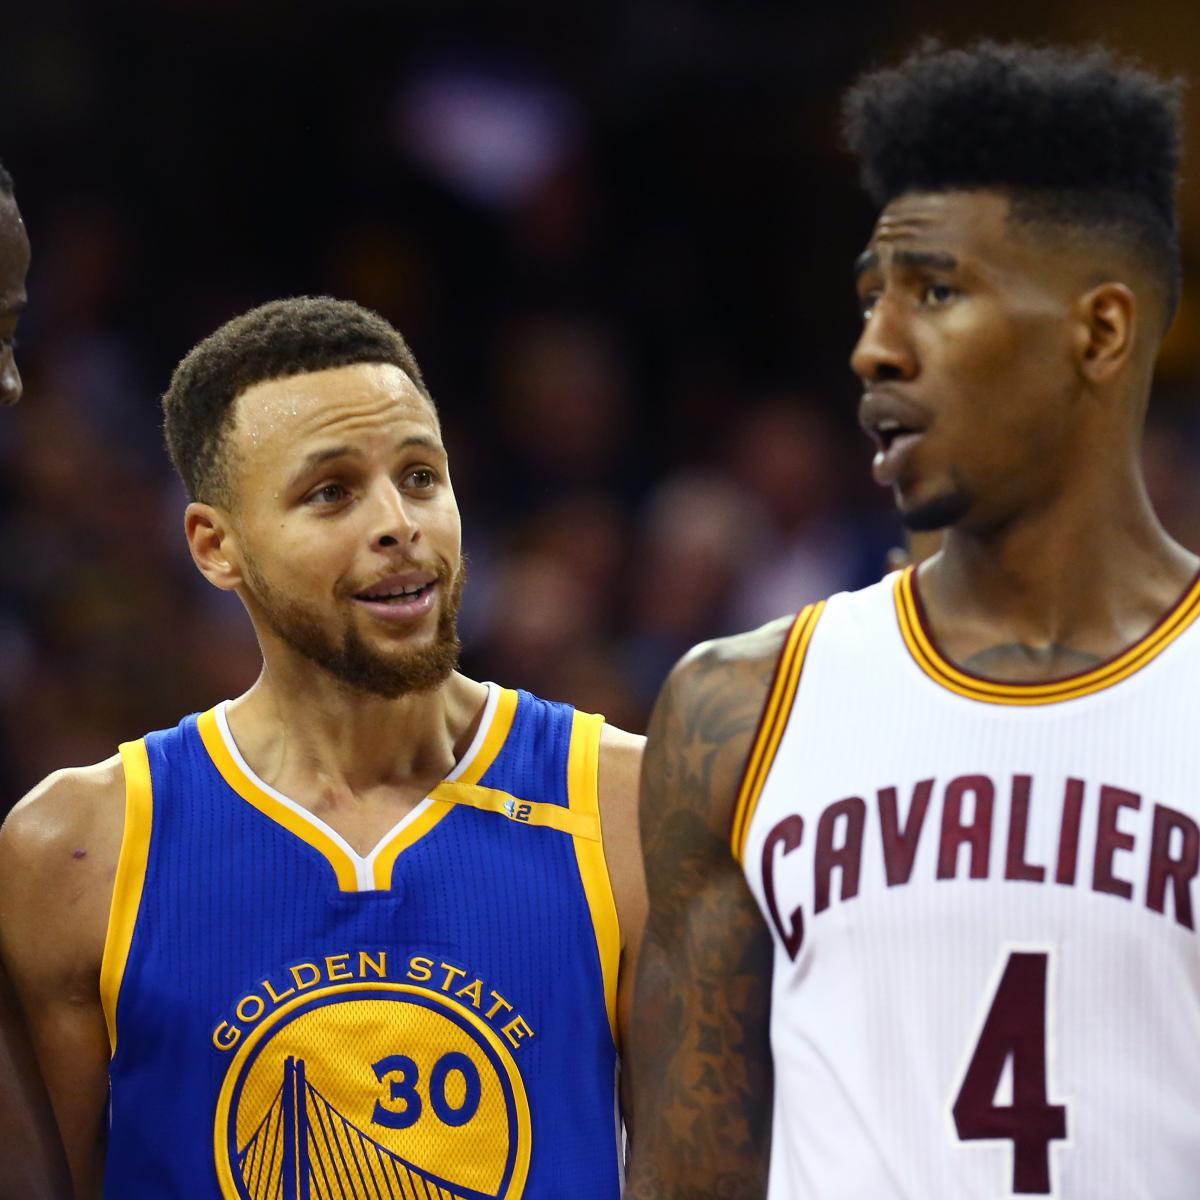 Houston Rockets Iman Shumpert: Iman Shumpert Trade Rumors: Cavs, Rockets Talks Have